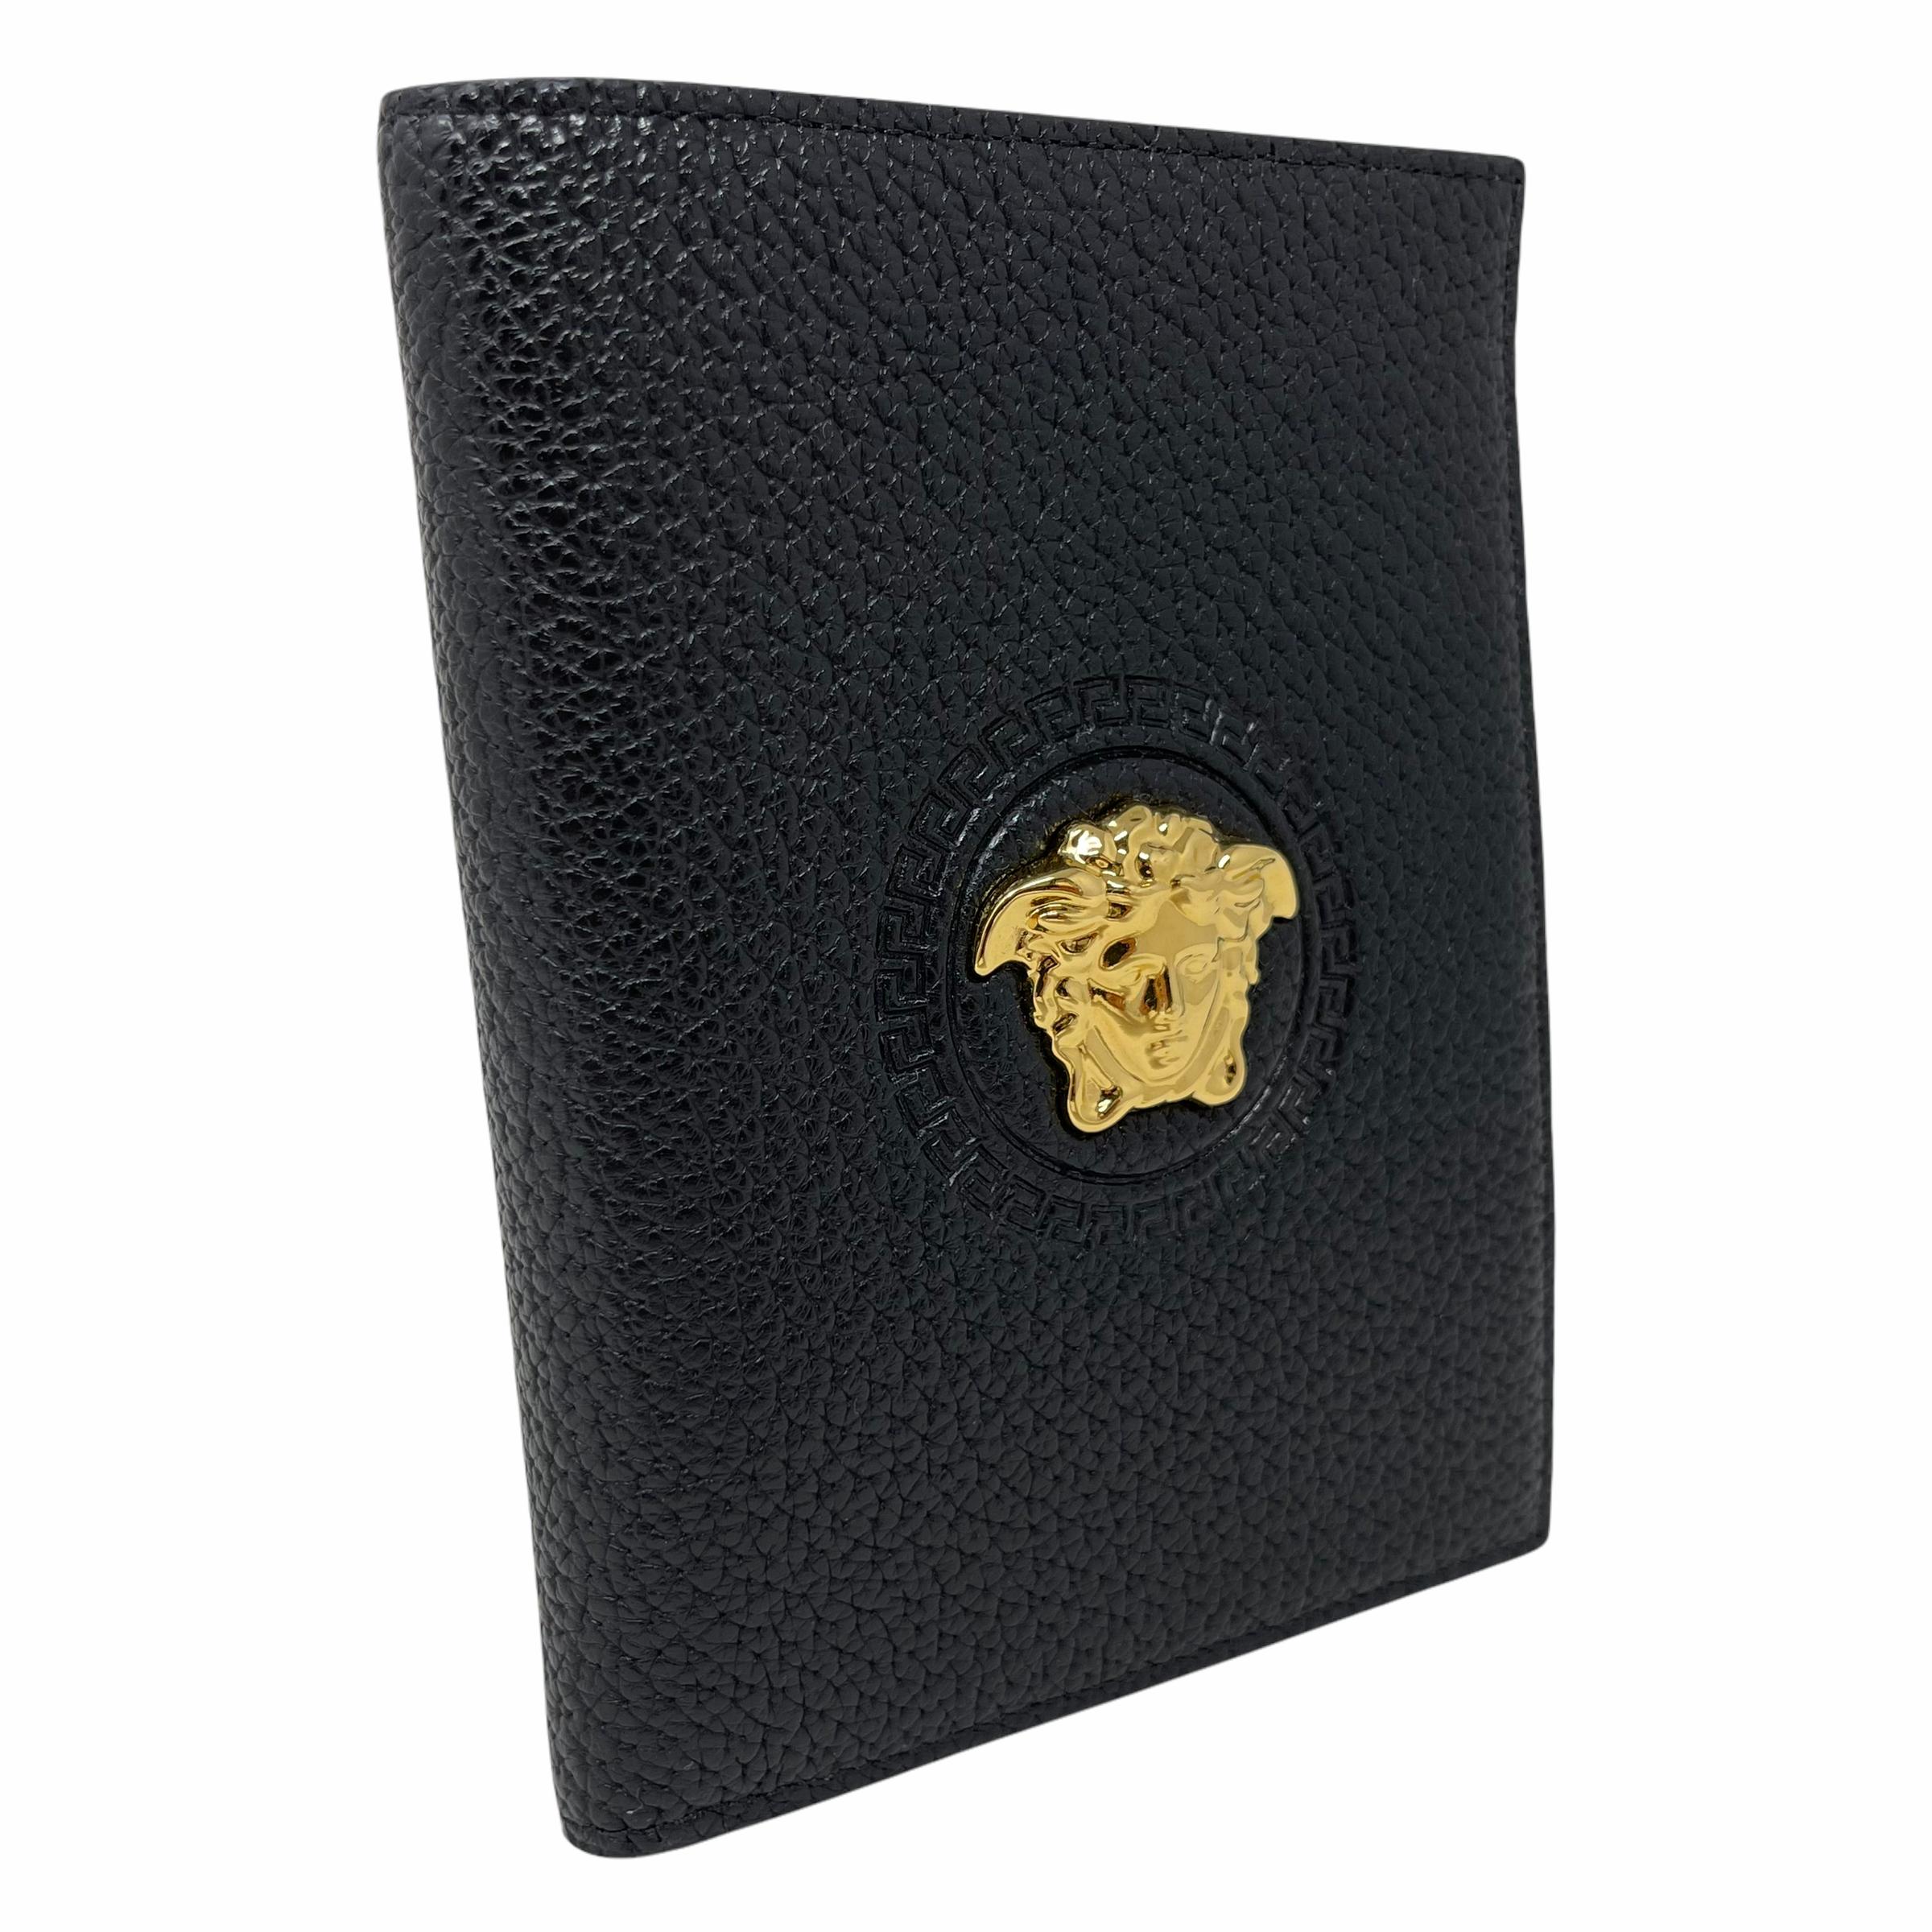 VERSACE NEW Versace Black Medusa Head Leather Passport Holder